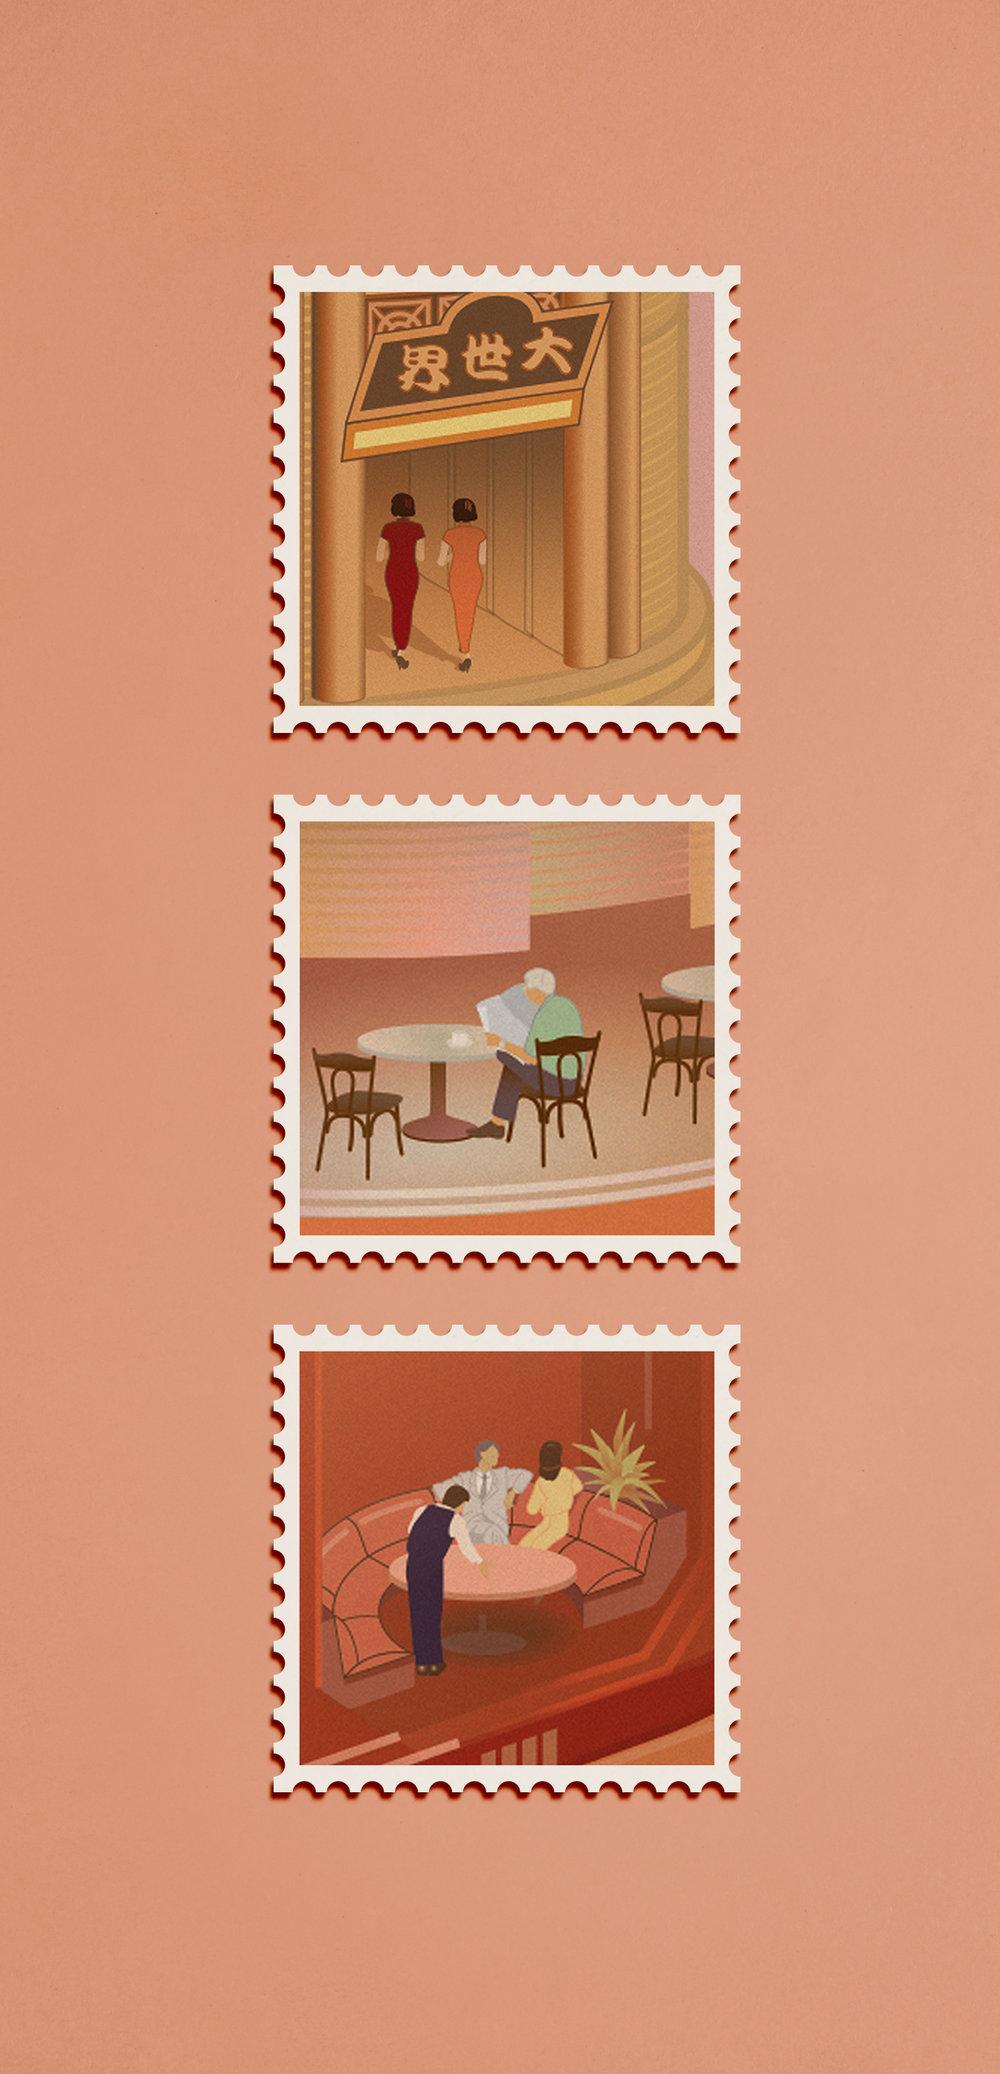 Routledge book portfolio stamps 3.jpg